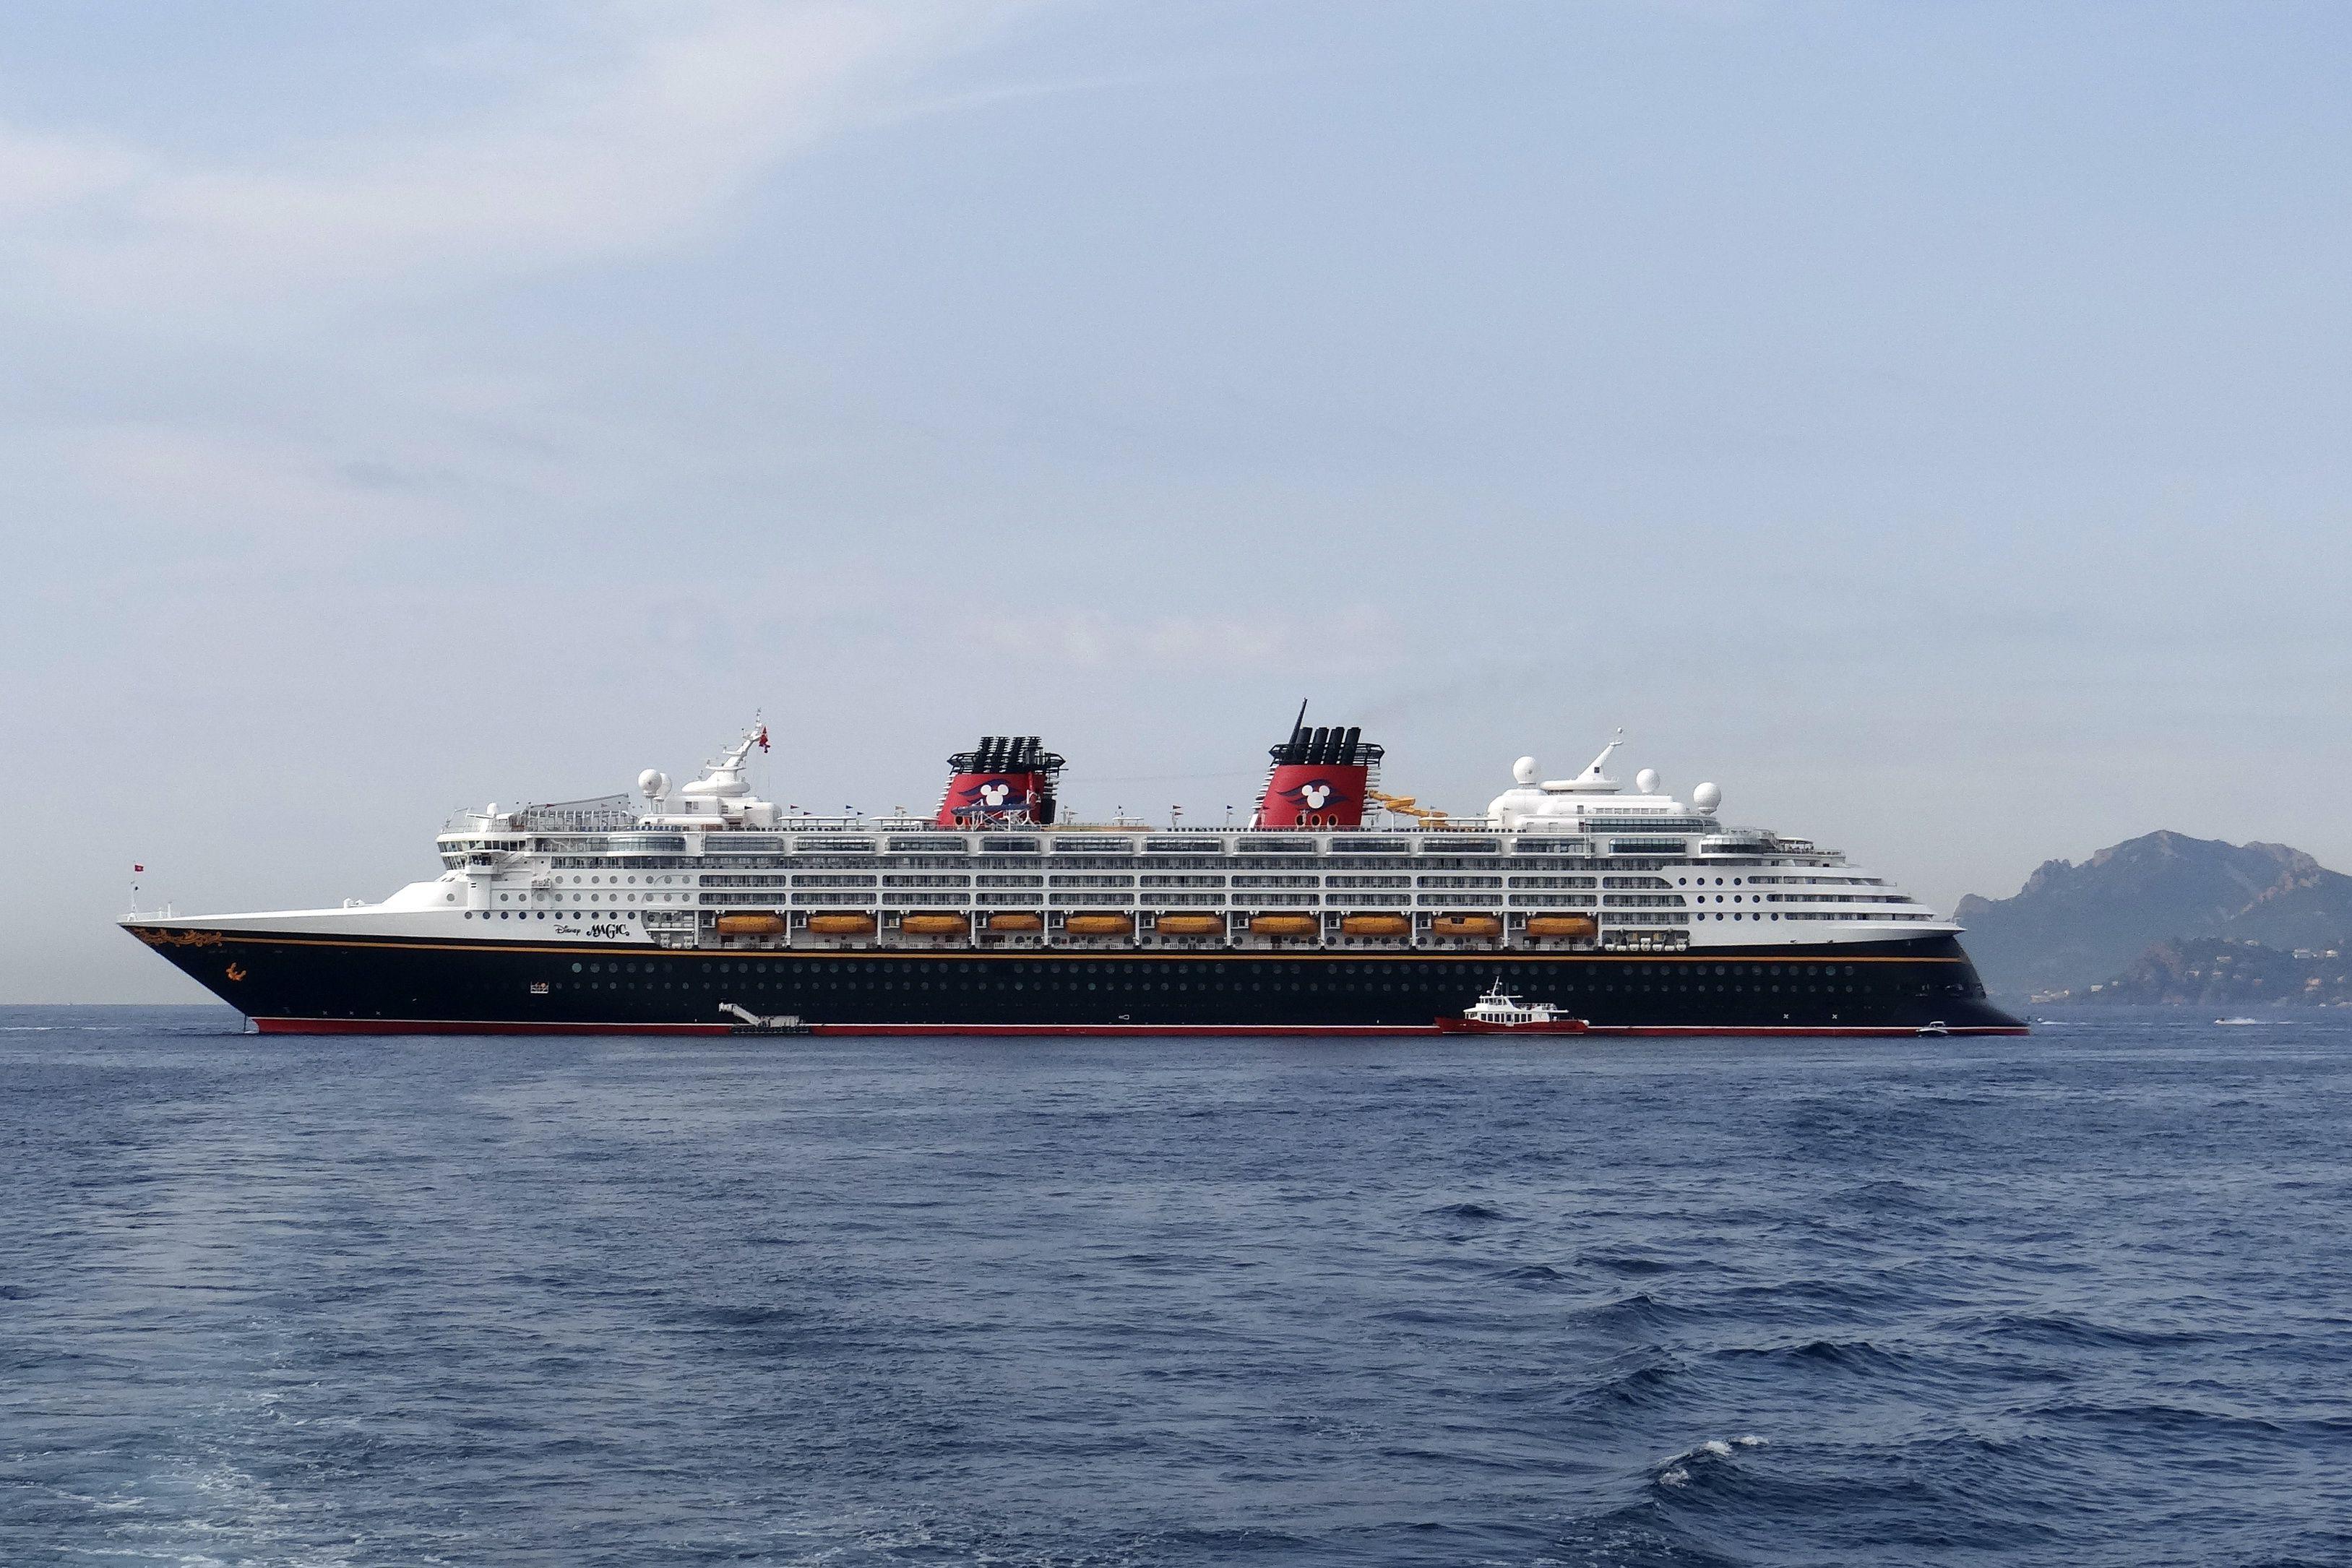 Tour Of Disney Cruise Line Ship